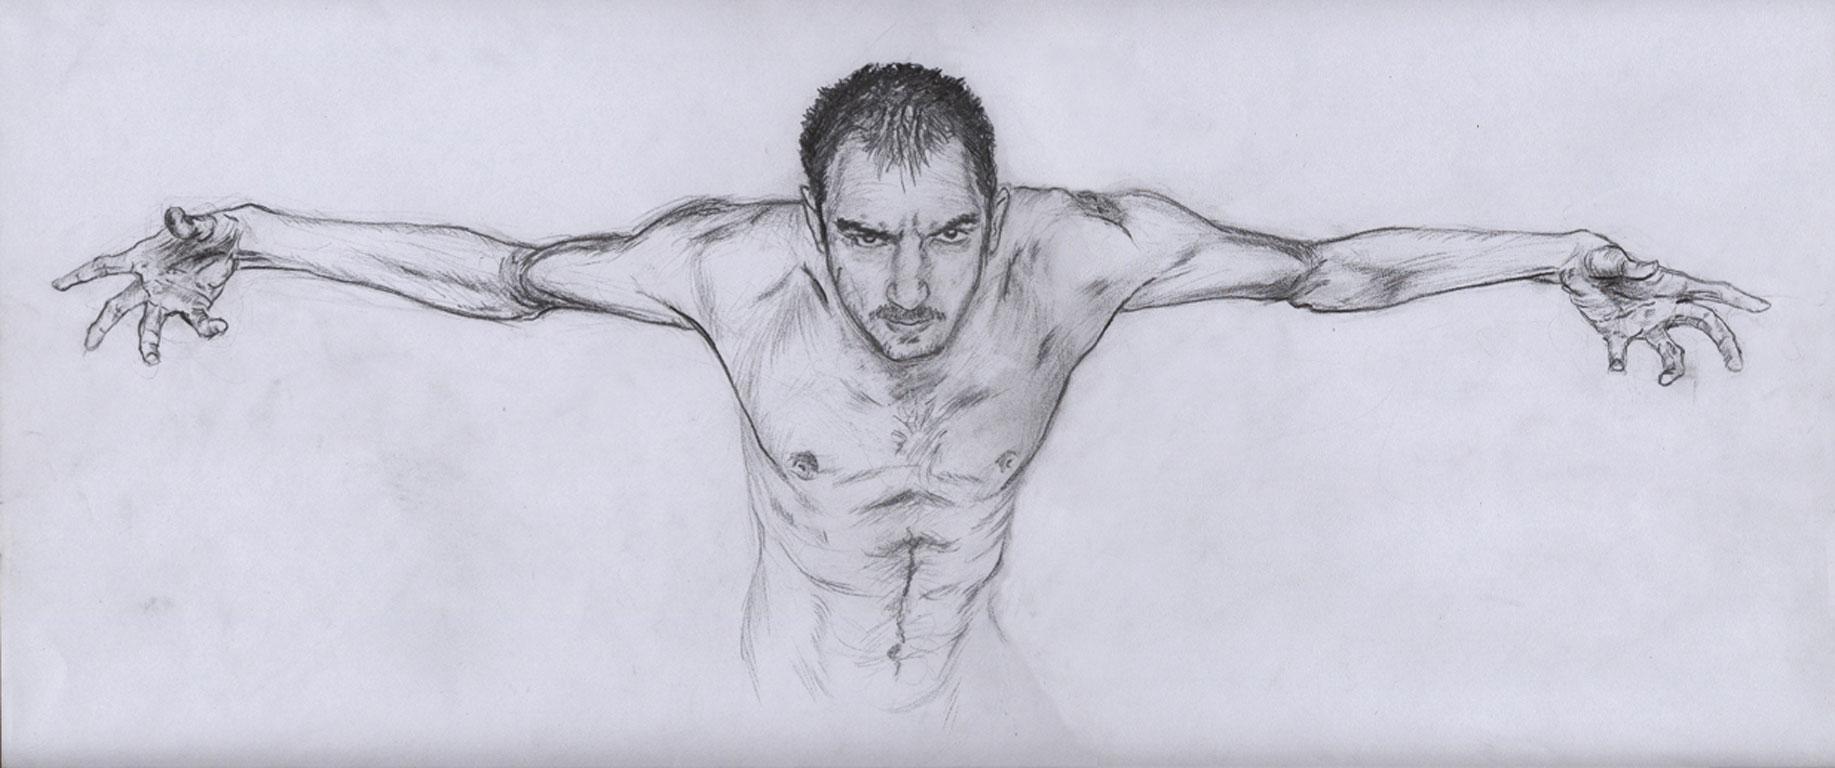 ivanbelarus emre alkaç ivan belarus grafik tasarım çizim